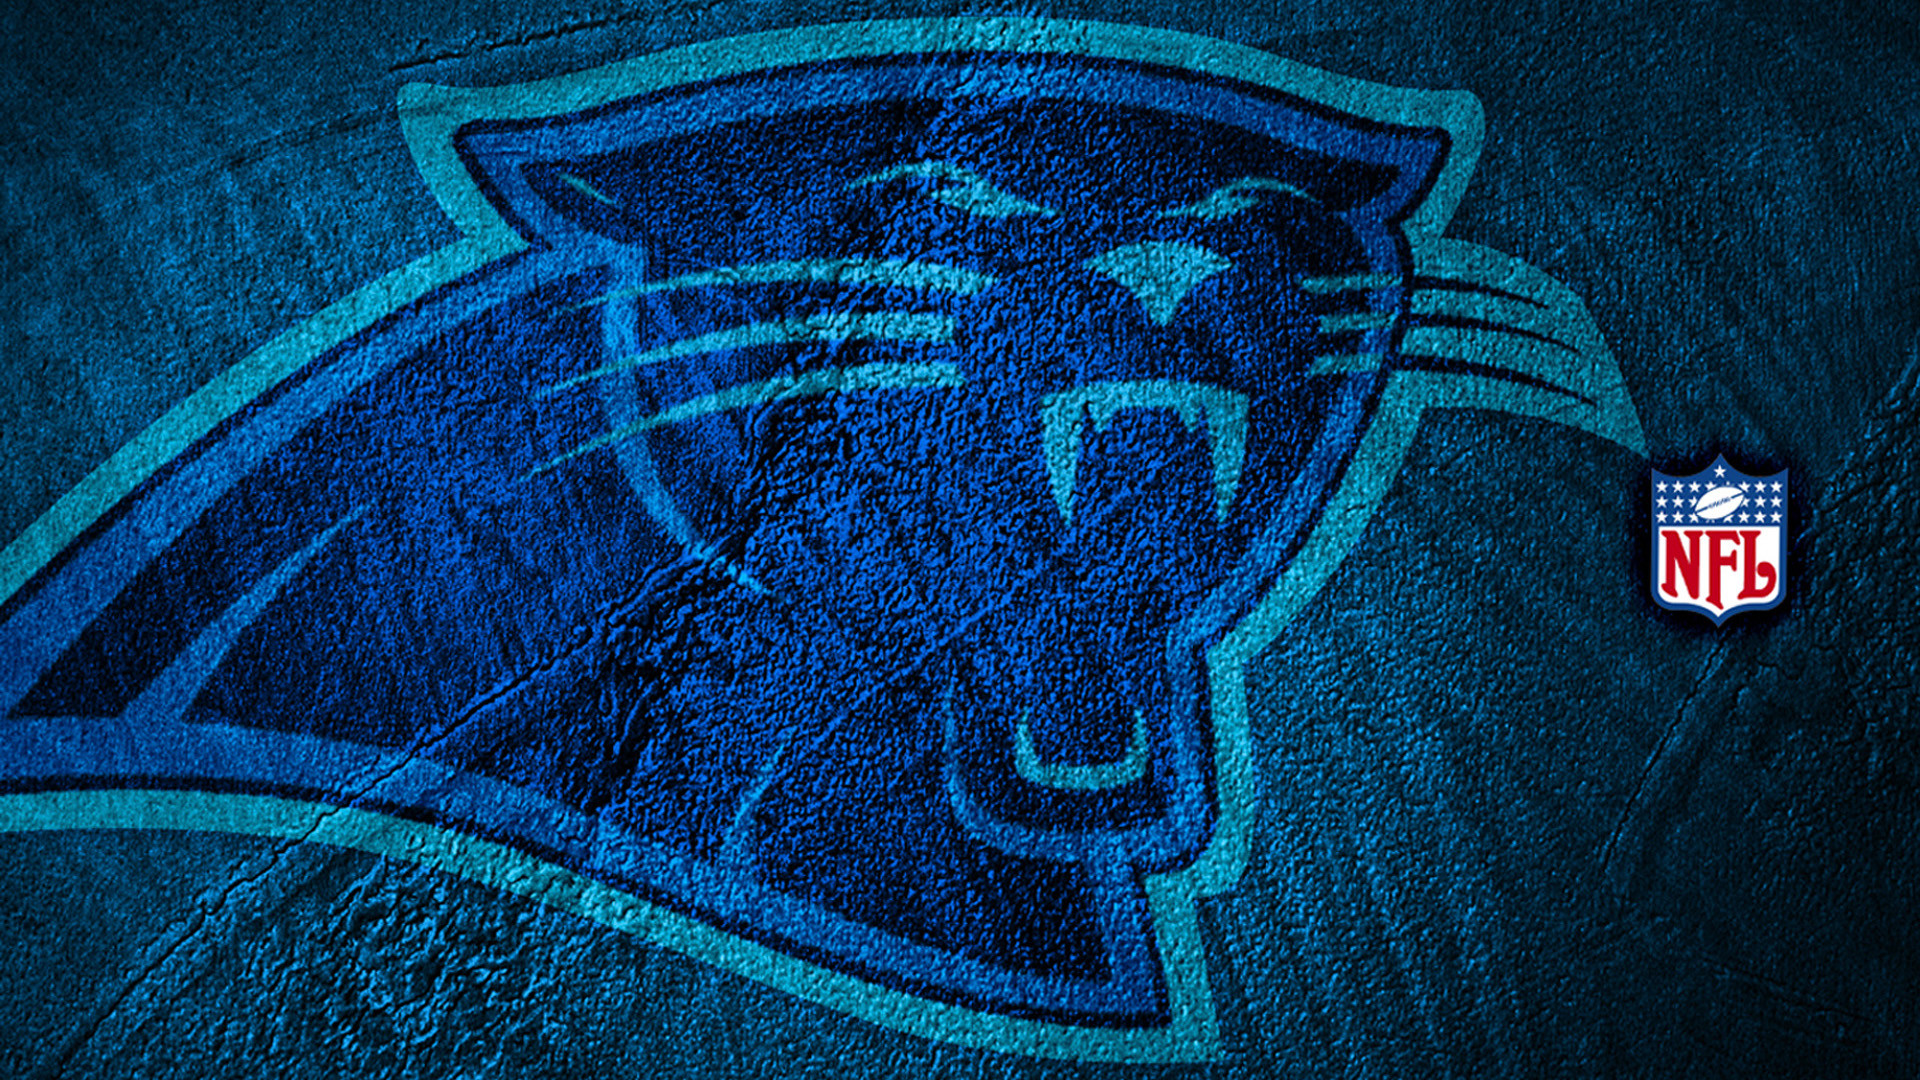 Carolina Panthers Wallpaper Background 70 Images